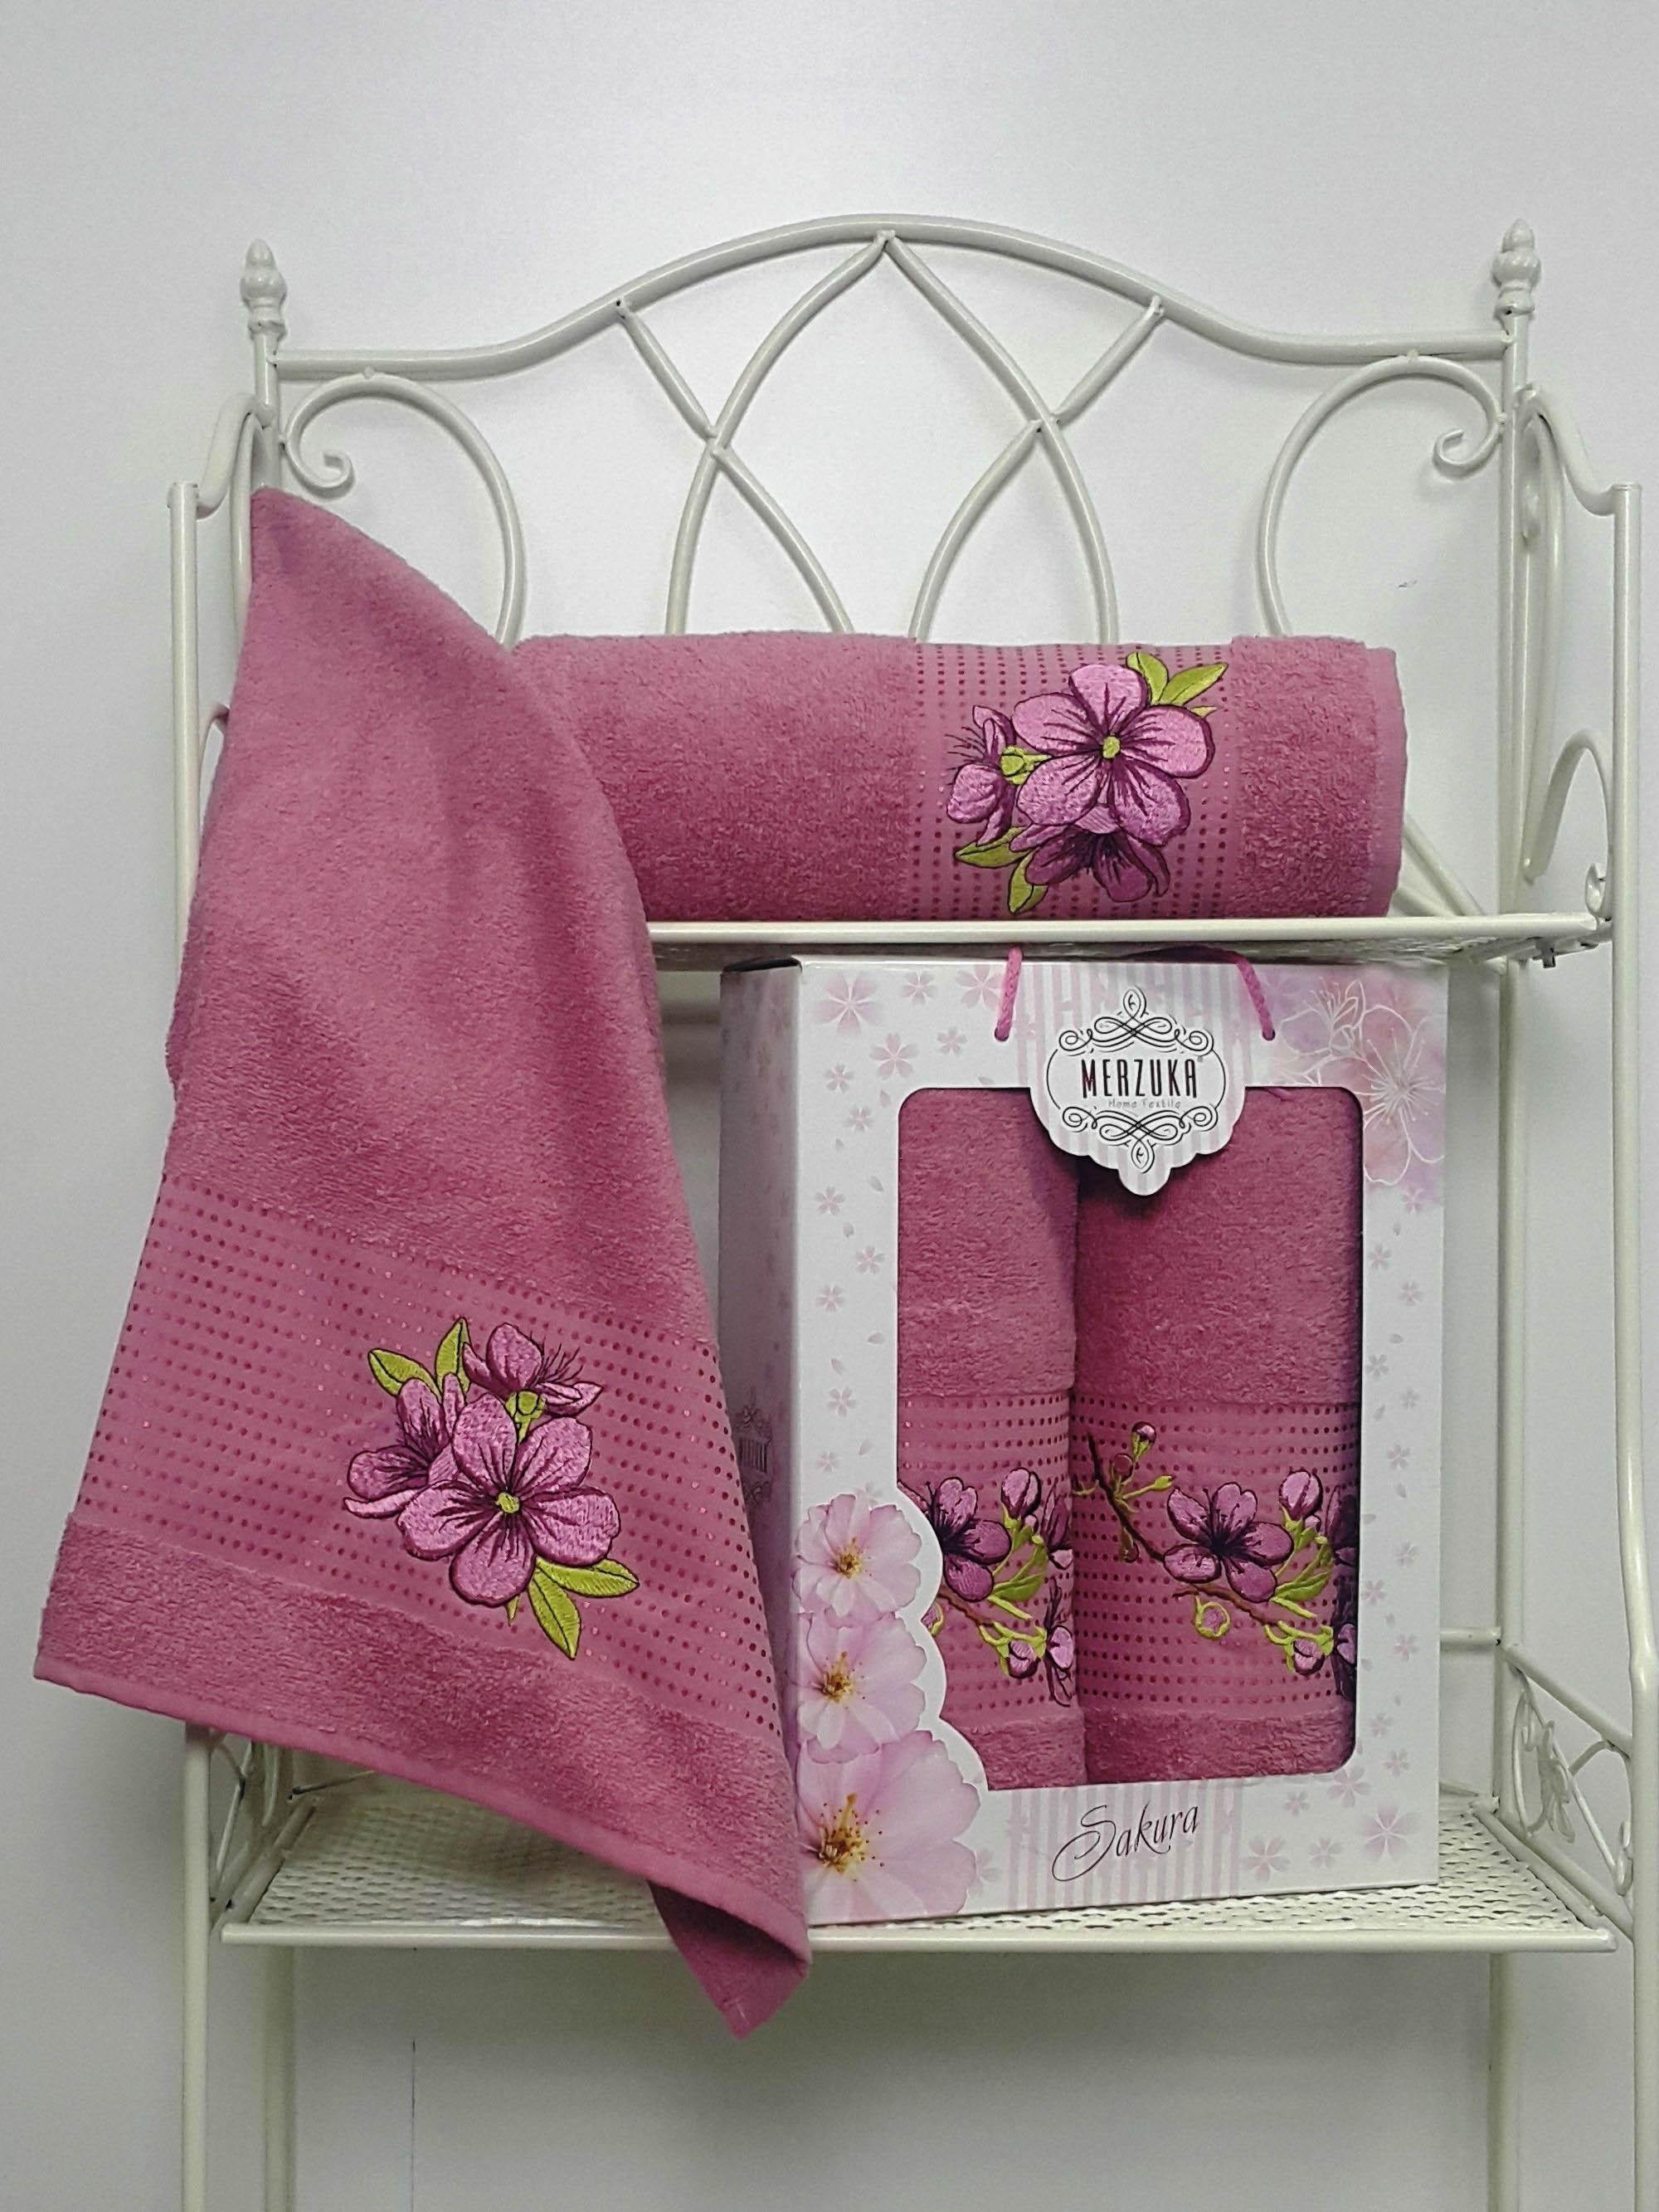 Полотенца Oran Merzuka Полотенце Sakura Цвет: Тёмно-Розовый (Набор) набор из 3 полотенец merzuka sakura 50х90 2 70х140 8432 терракотовый